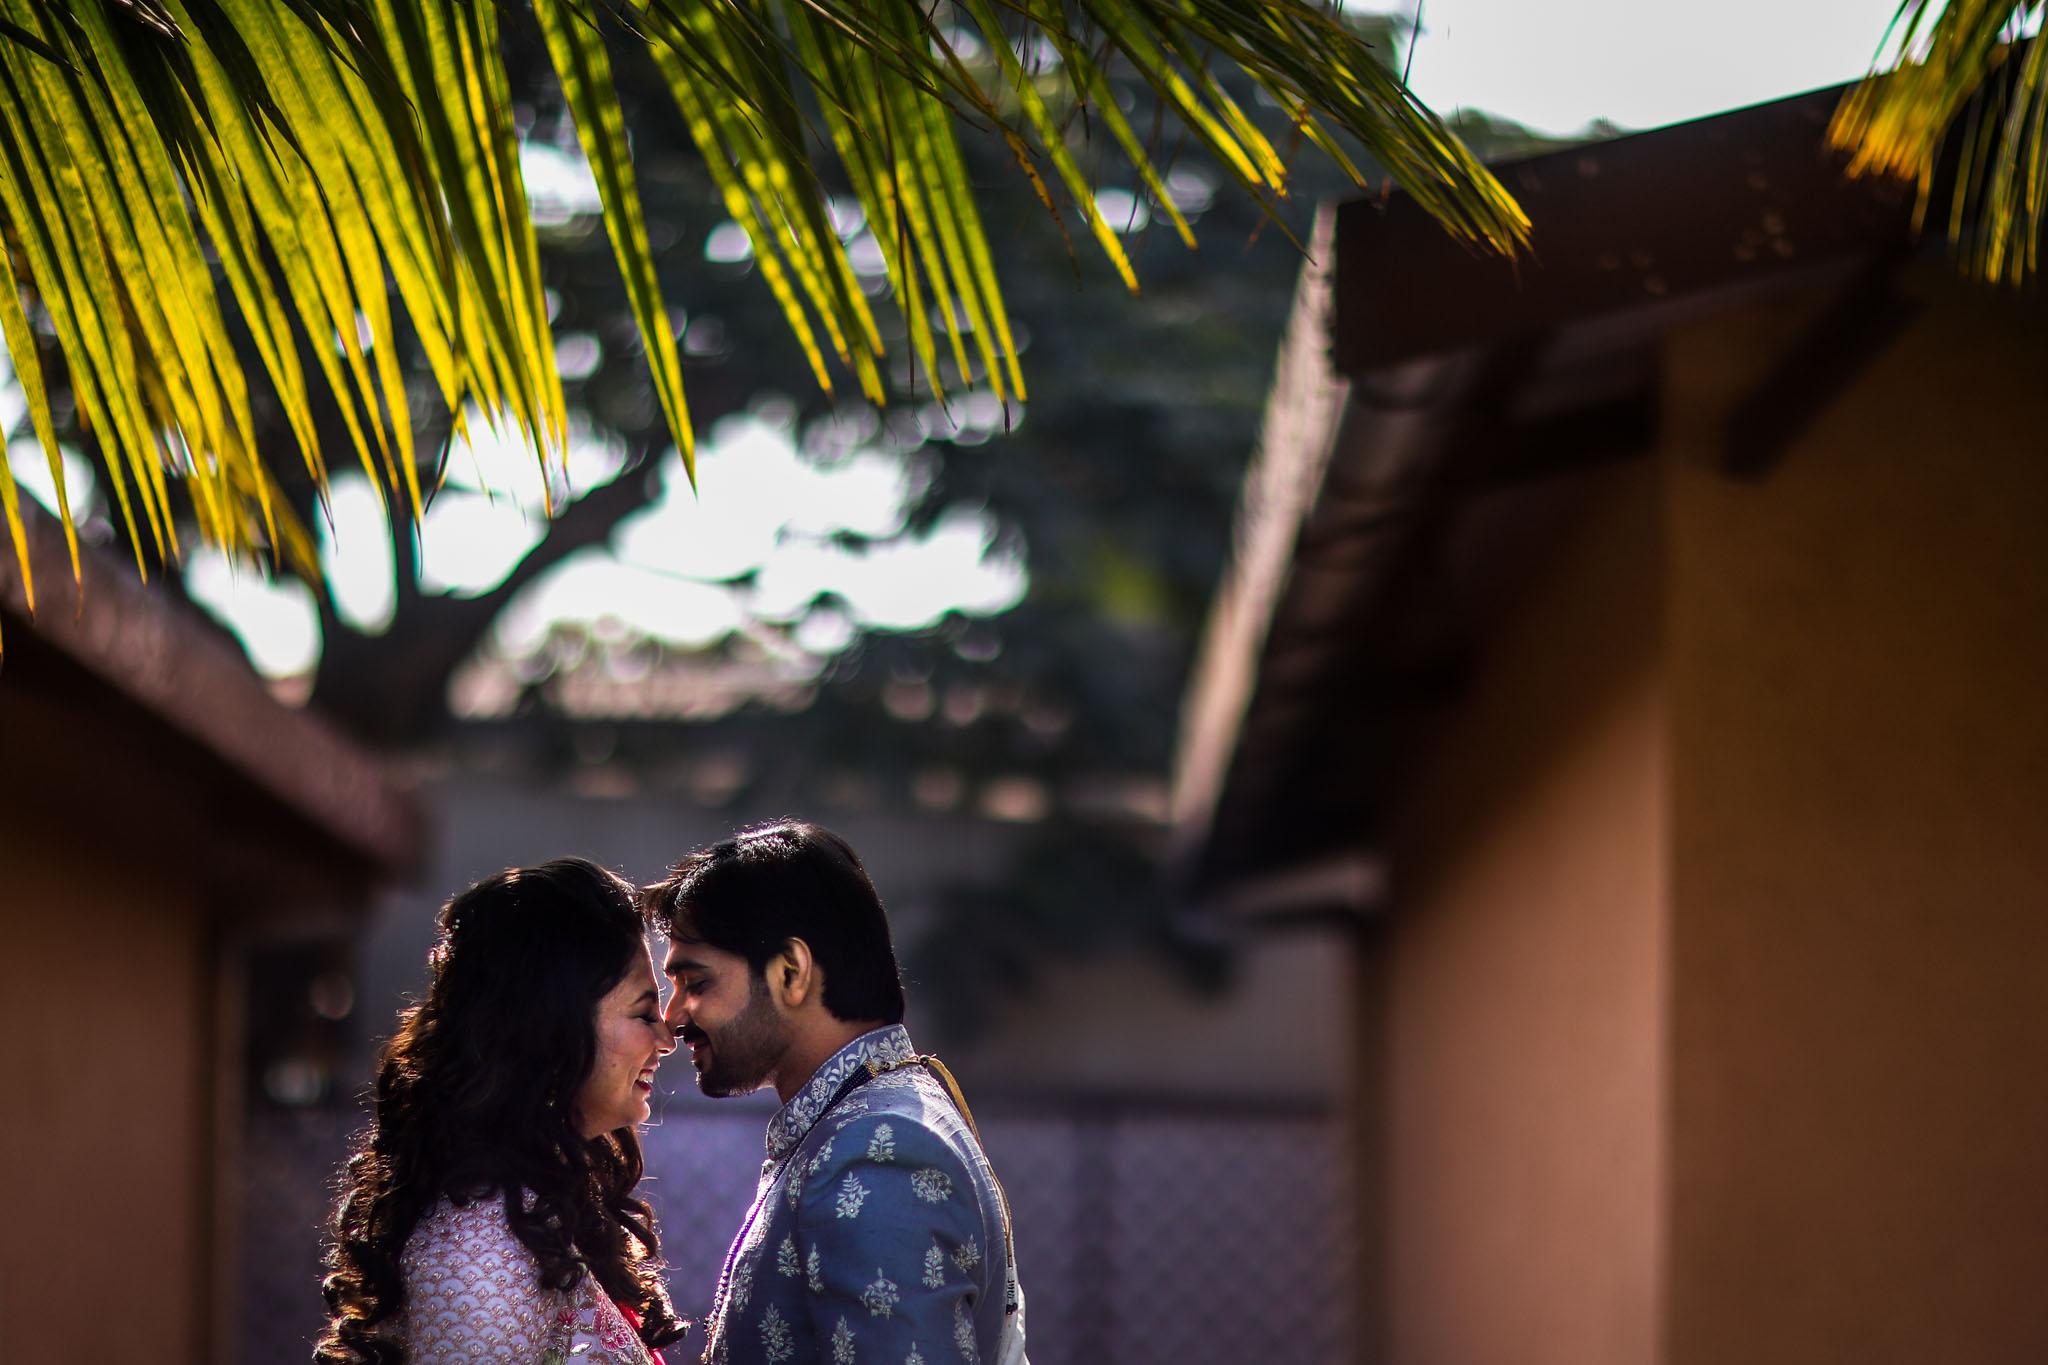 Mukti x Ojas Wedding Akshjay Sansare Photography Best wedding photographer in mumbai India Candid Cinematic Films videos-22.jpg